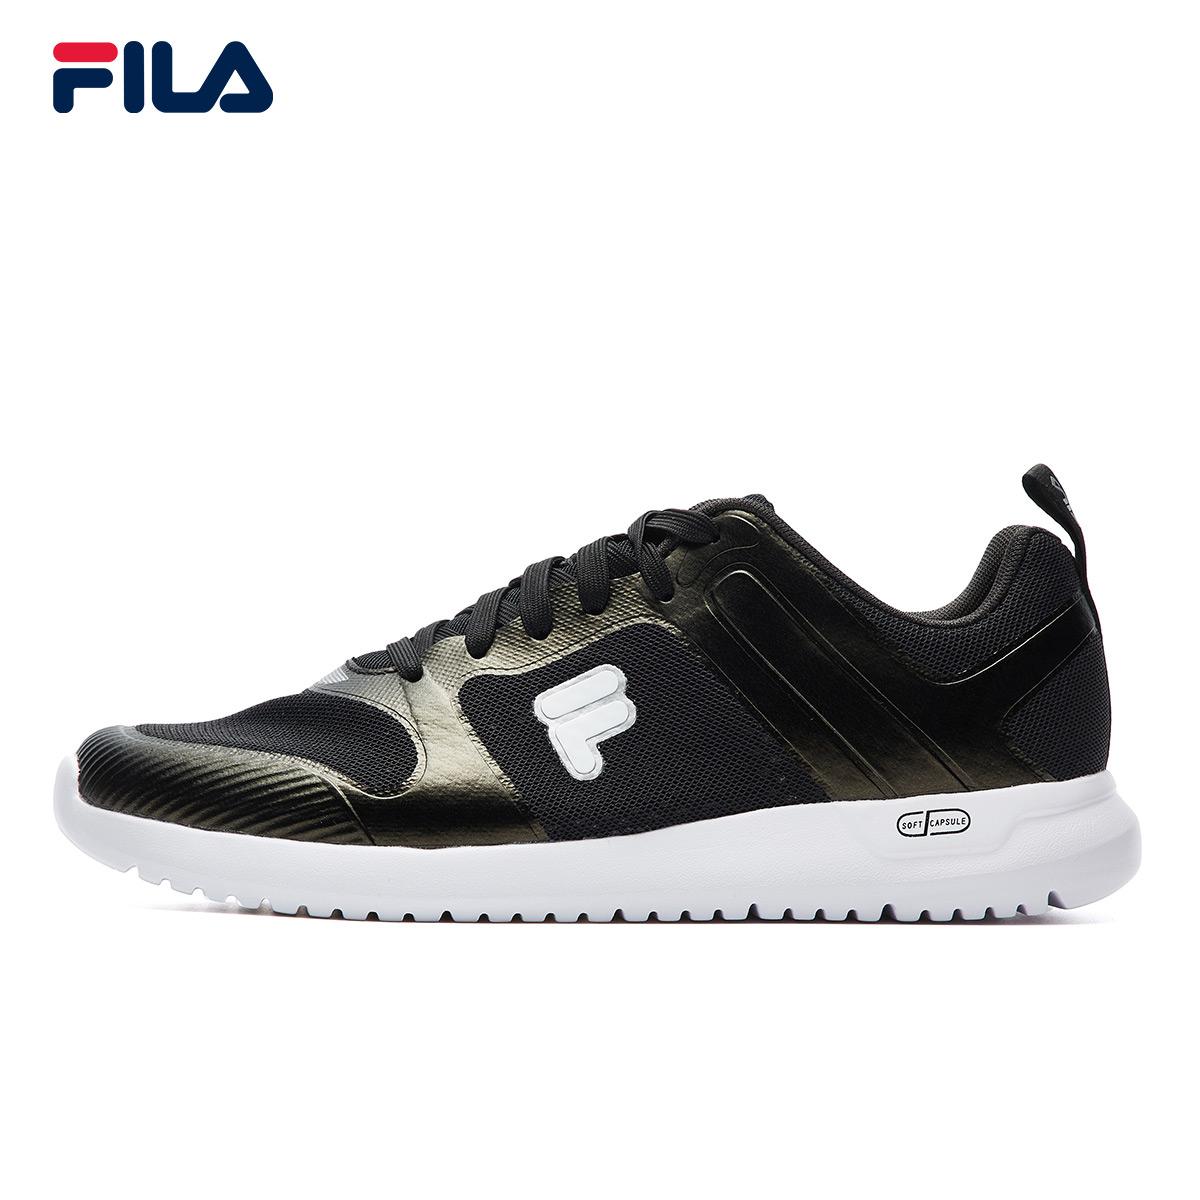 FILA斐乐男鞋2018夏季新款运动鞋跑步鞋简约易搭透气网布训练鞋男